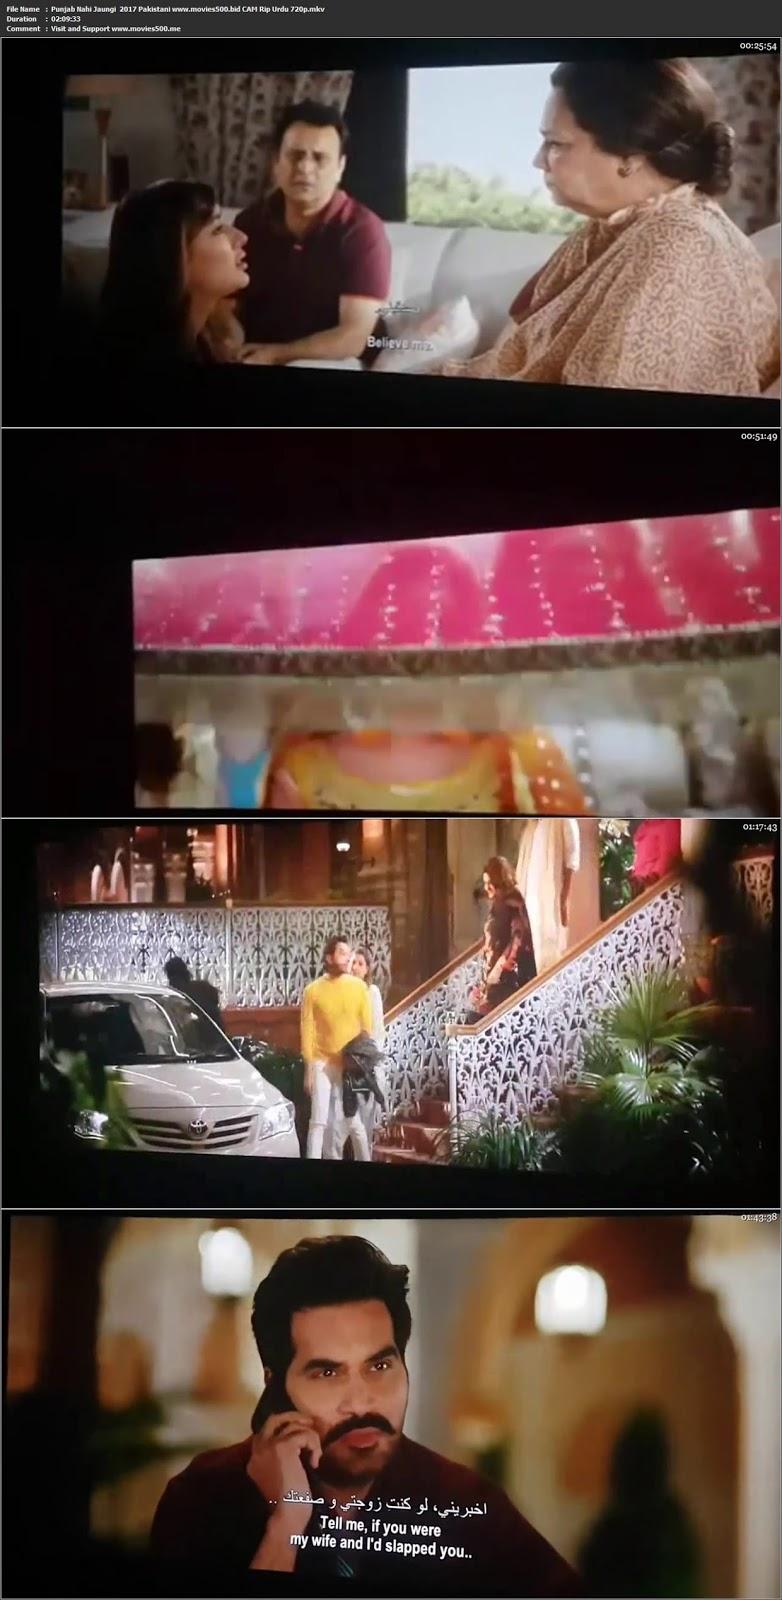 Punjab Nahi Jaungi 2017 Pakistani Full Urdu Movie pDVDRip 720p at 9966132.com